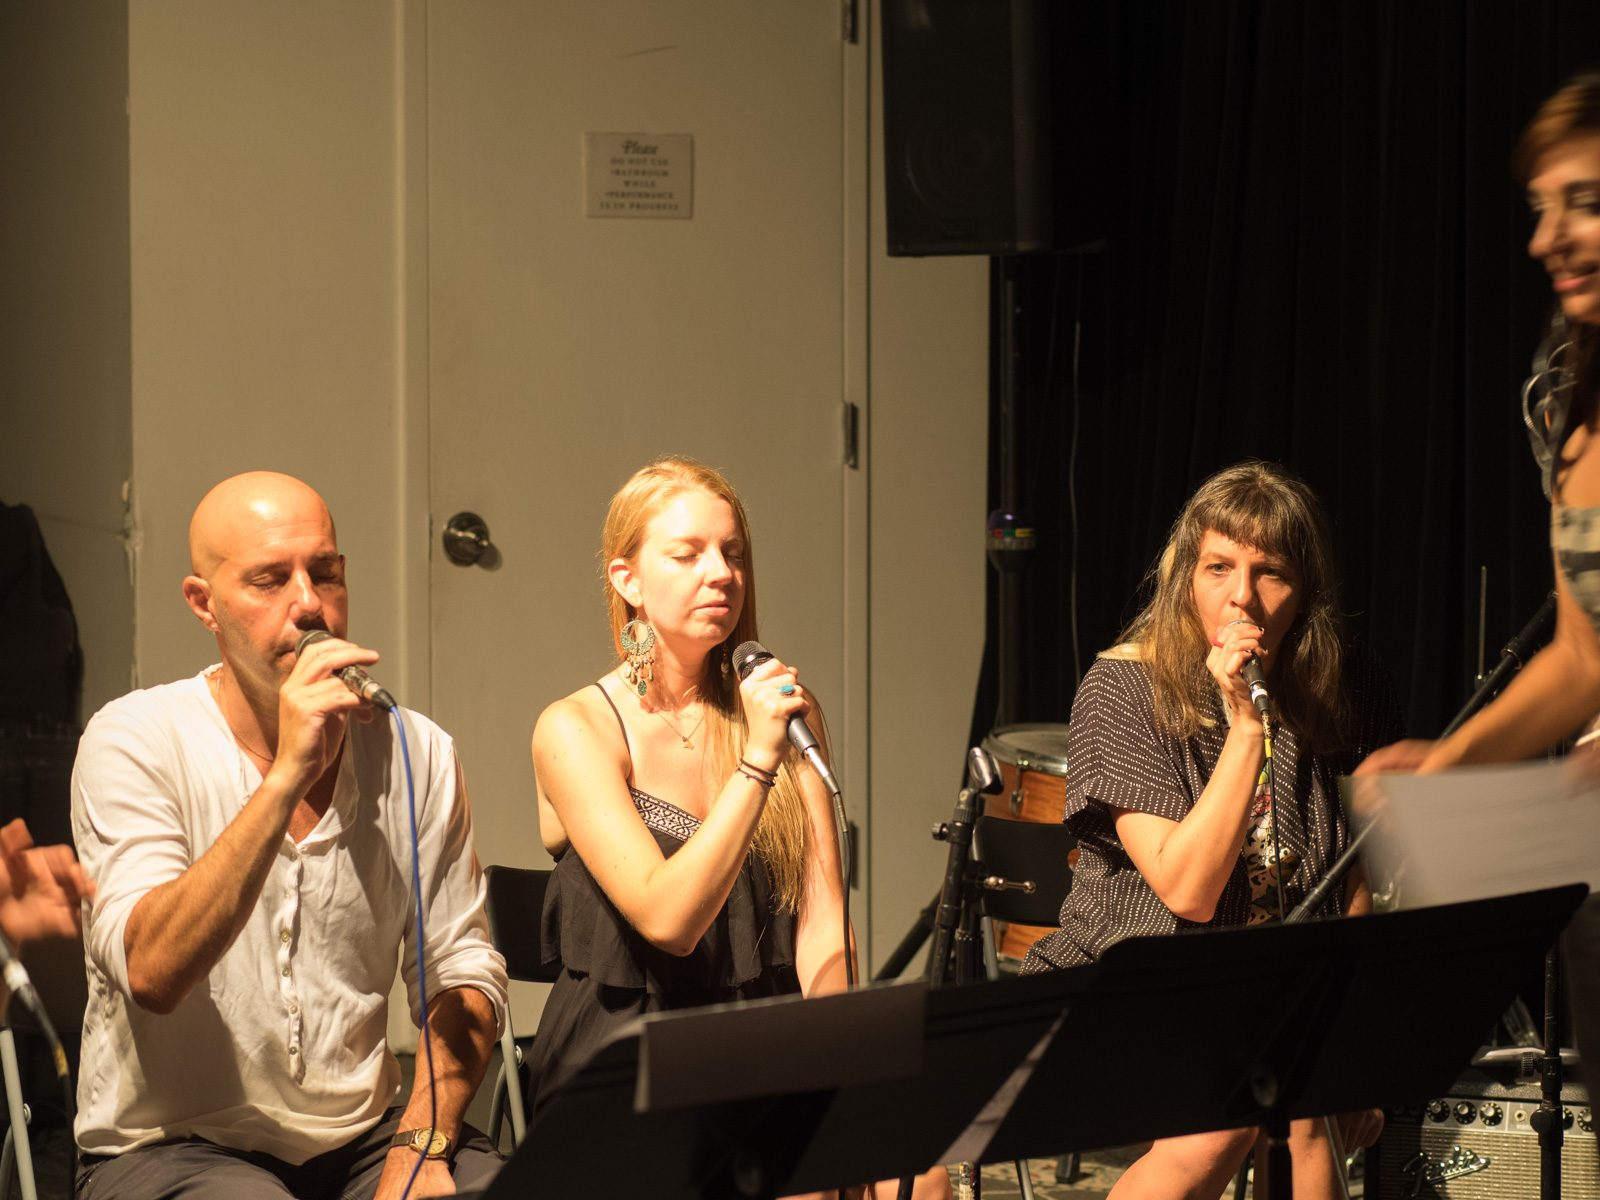 JD Walter, Aubrey Johnson, Monika Heidemann, and Sofia Rei